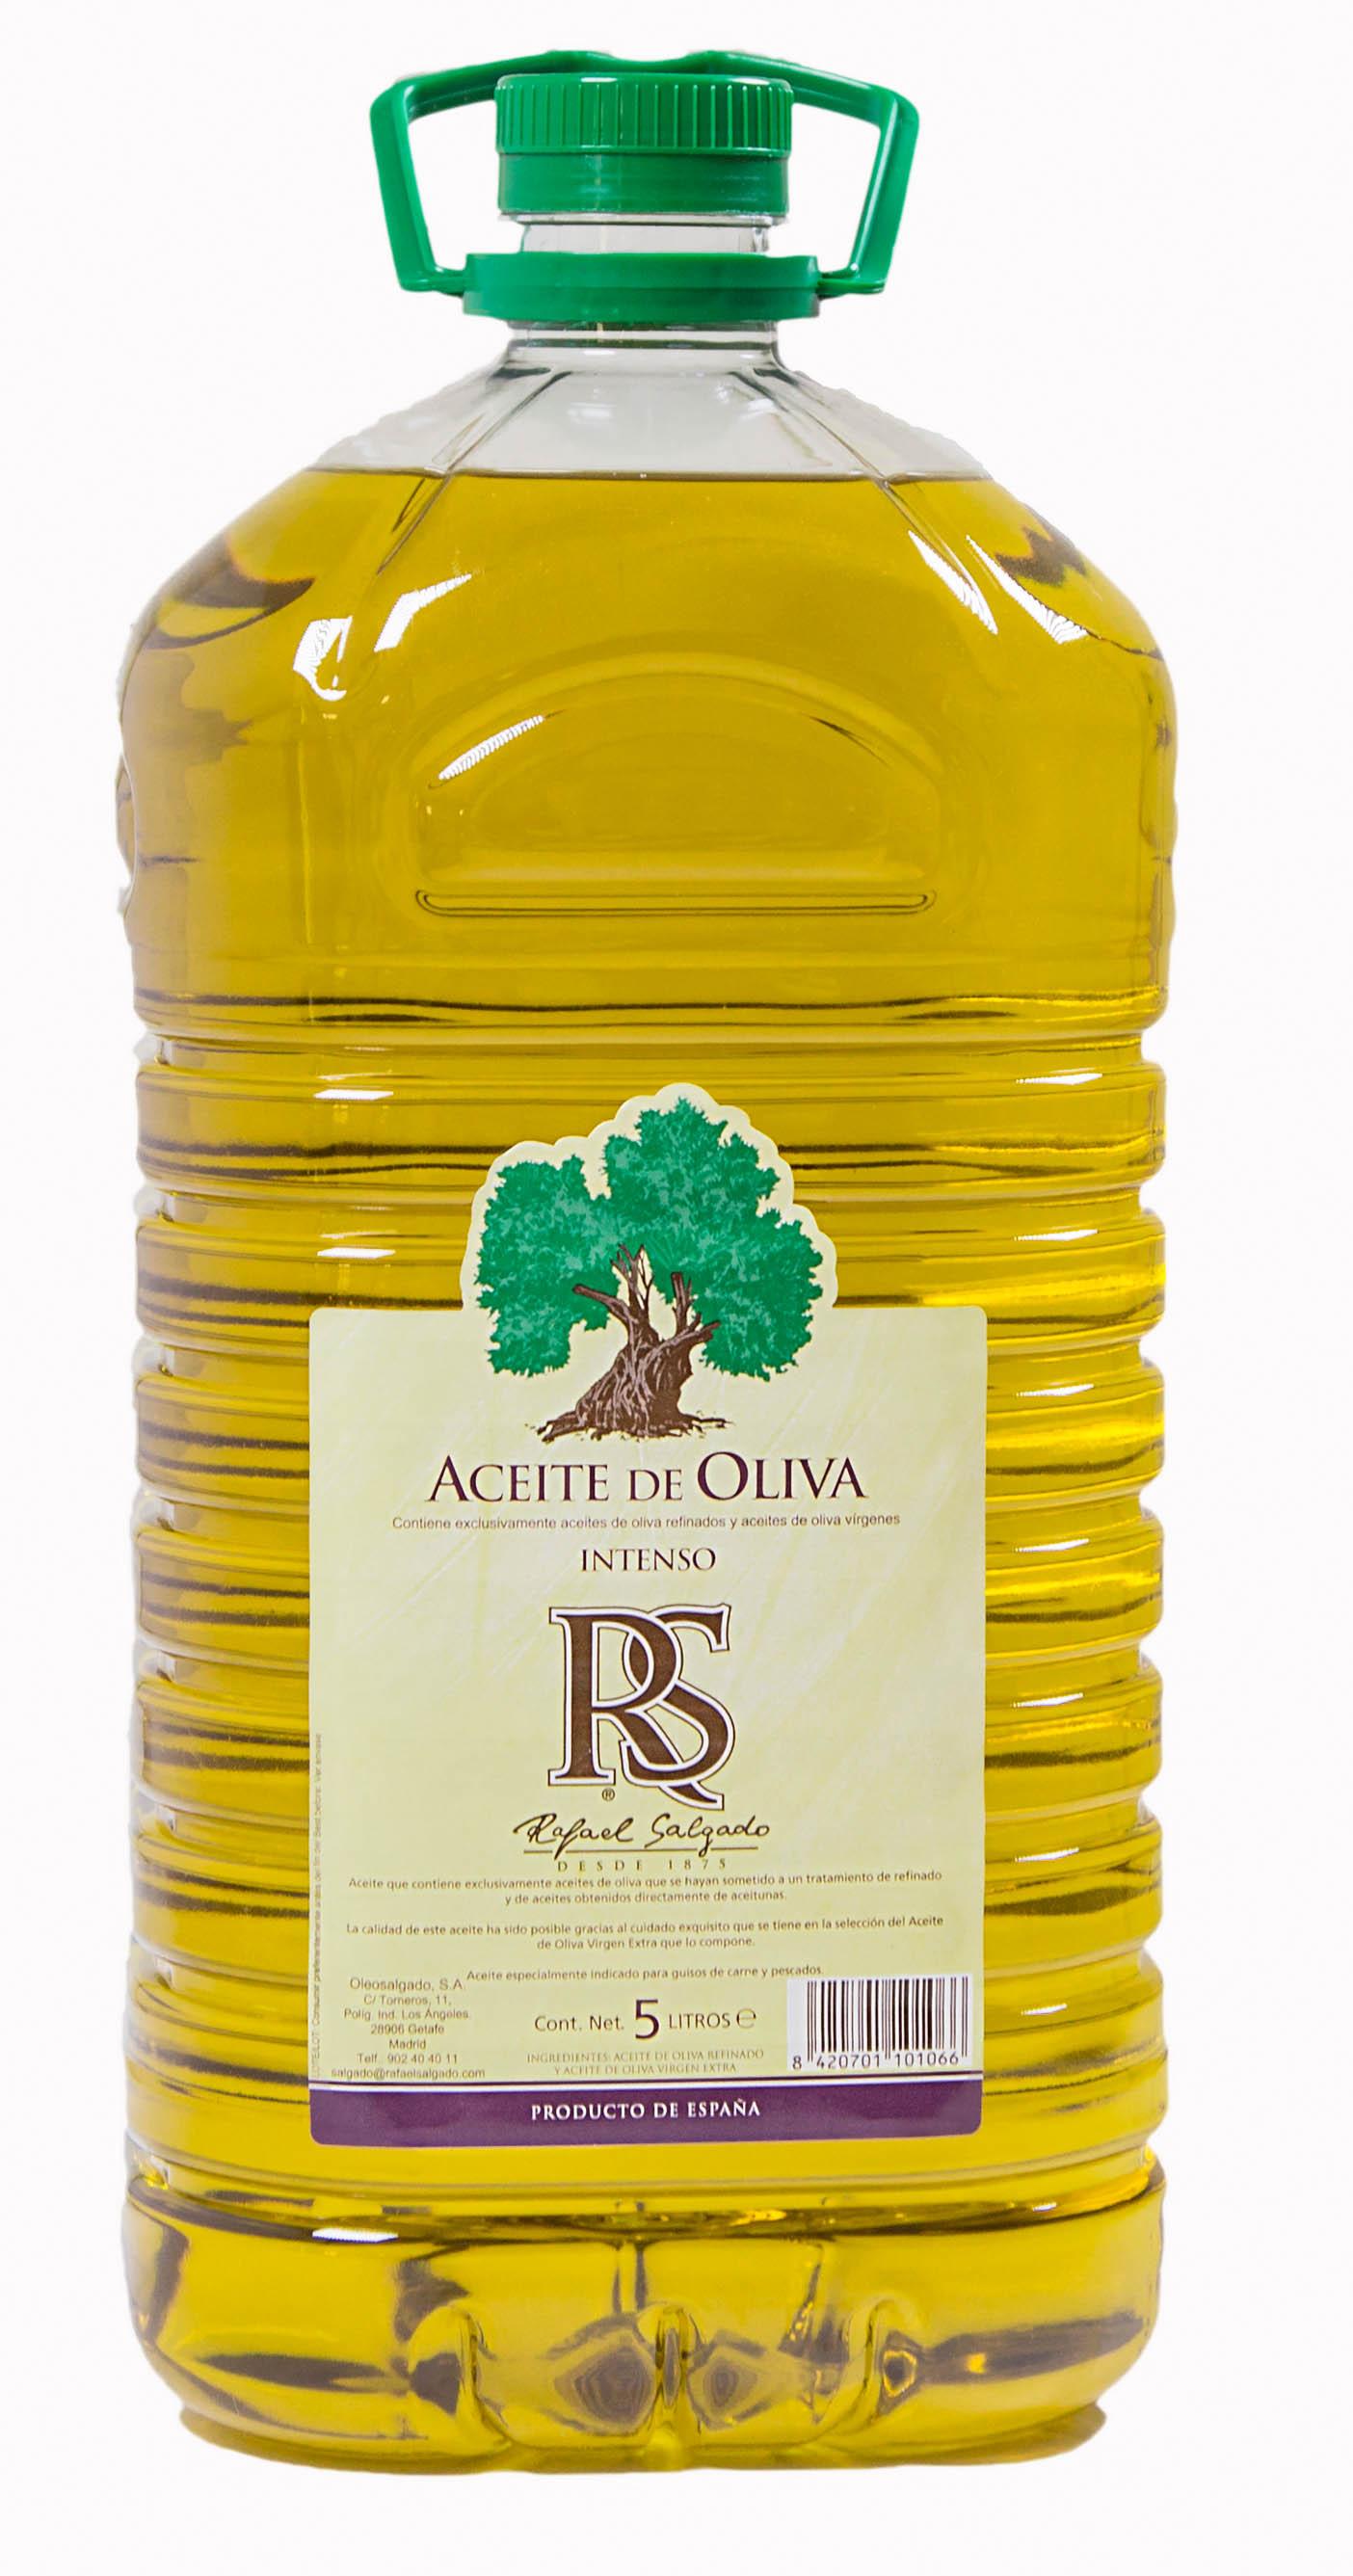 23bd7ba1014 Aceite de Oliva Intenso 1º Bidón RS 5 litros - Rafael Salgado ...